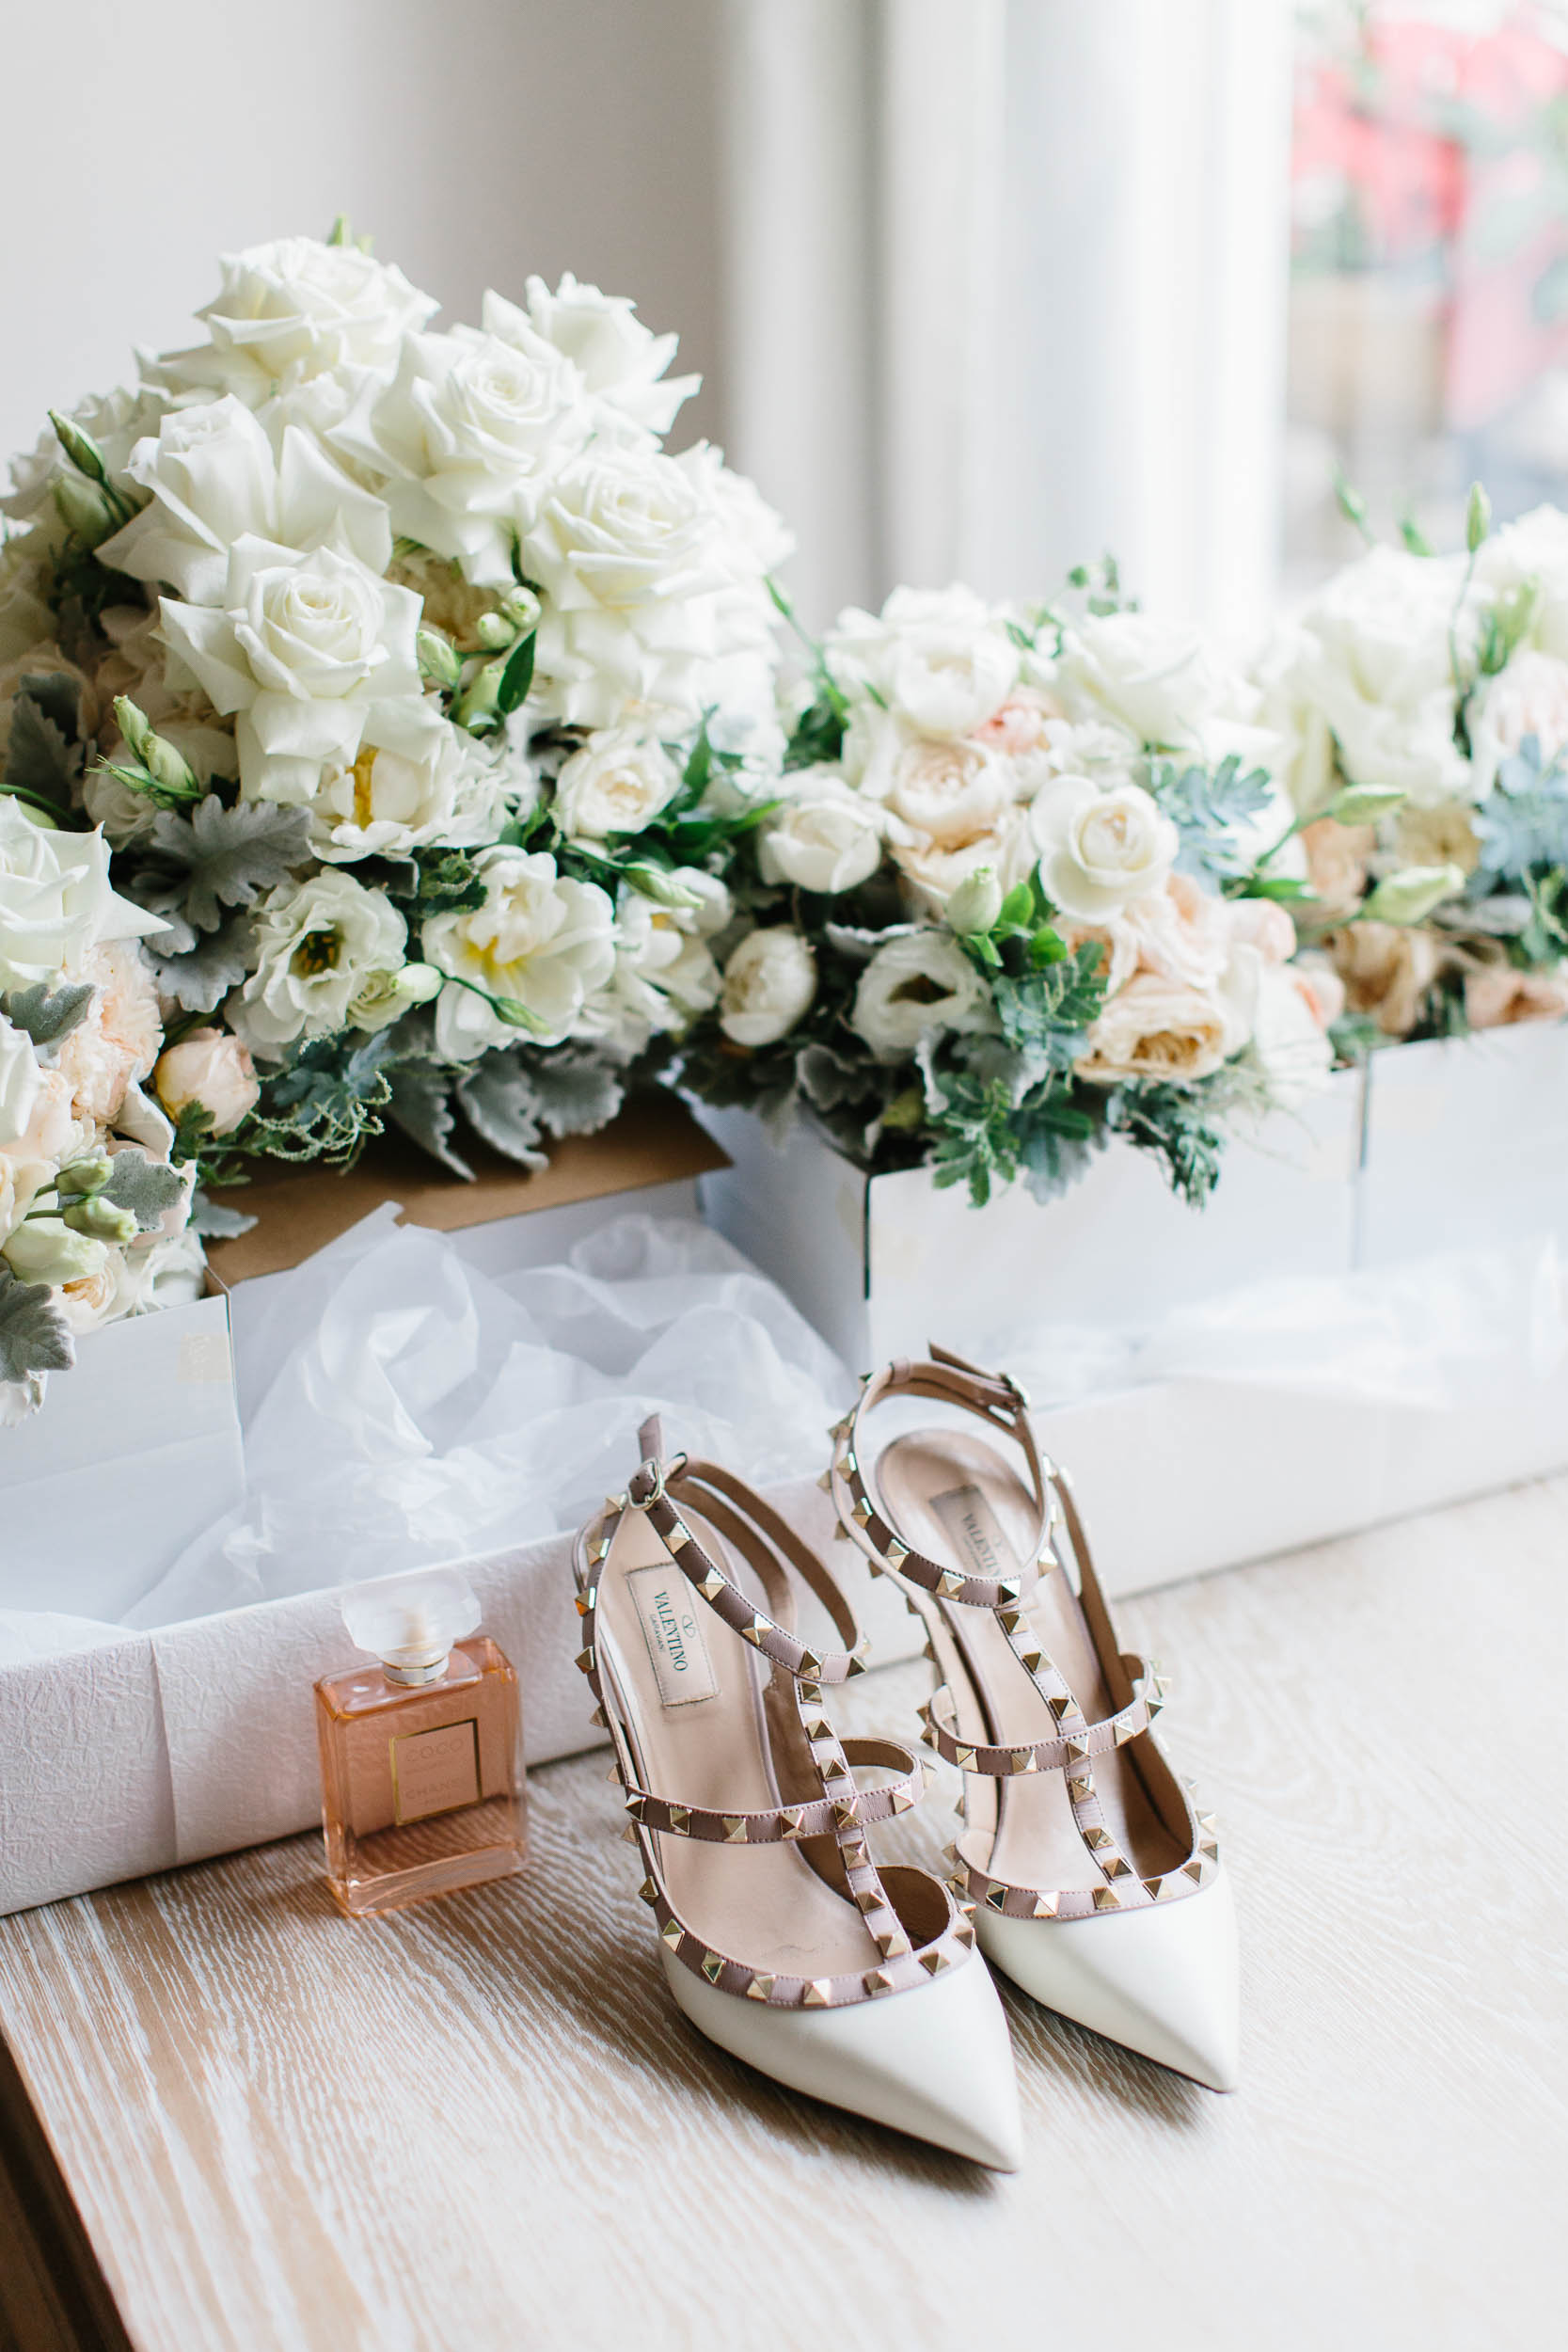 Kas-Richards-Mornington-Peninsula-Private-Property-Wedding-Marianna-Hardwick-Gown-79.jpg